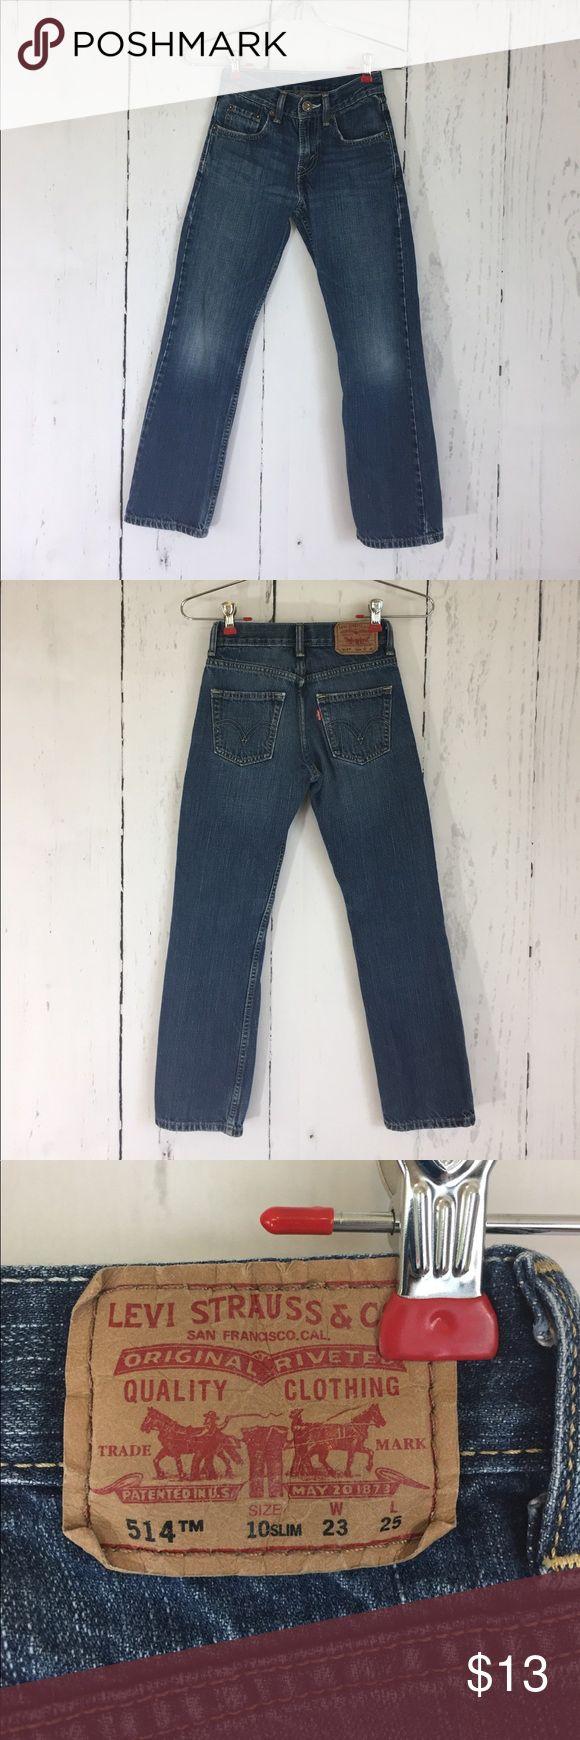 Levi's 514 Size 10 slim 23x25 Classic pair of Levi's size 10 slim; 23x25. Zipper fly. Levi's Bottoms Jeans